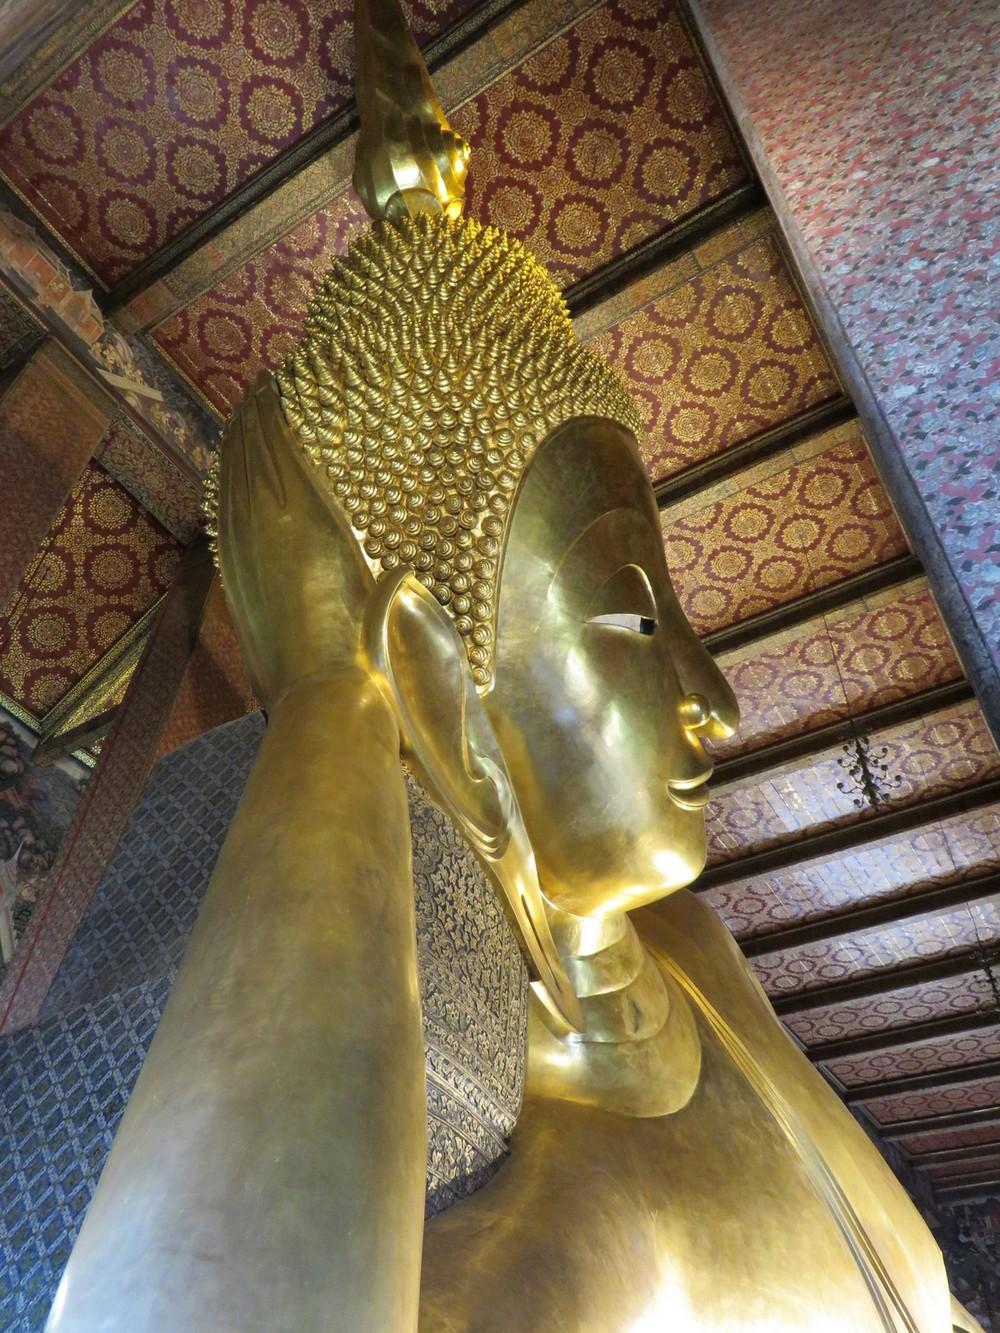 Reclining Buddha - an imposing profile!